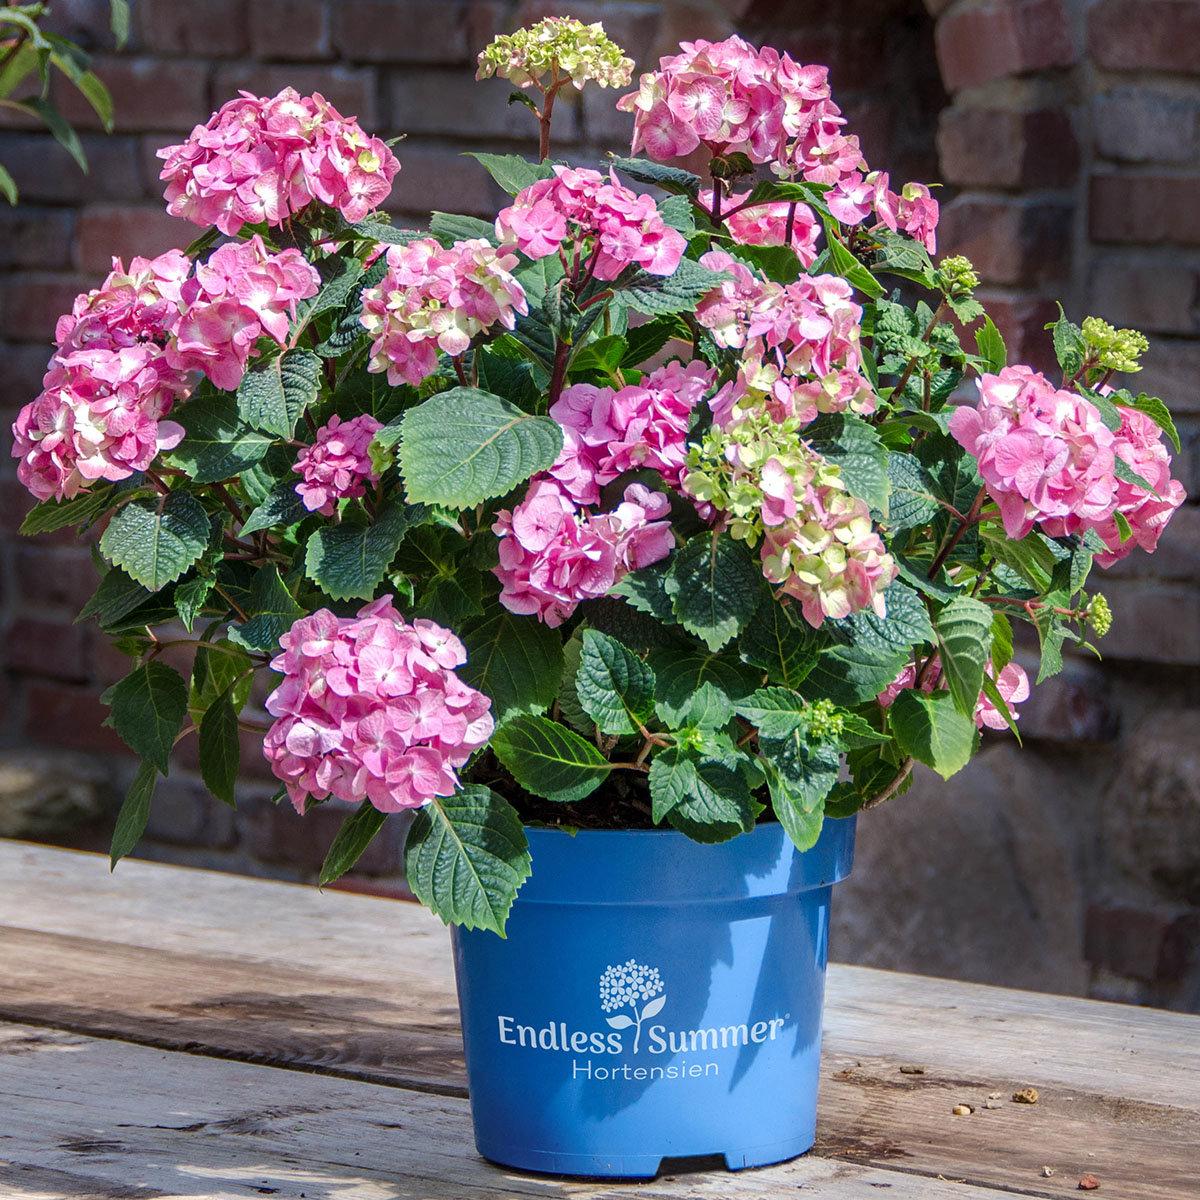 Hortensie Endless Summer® The Original, rosa, im ca. 23 cm-Topf   #4